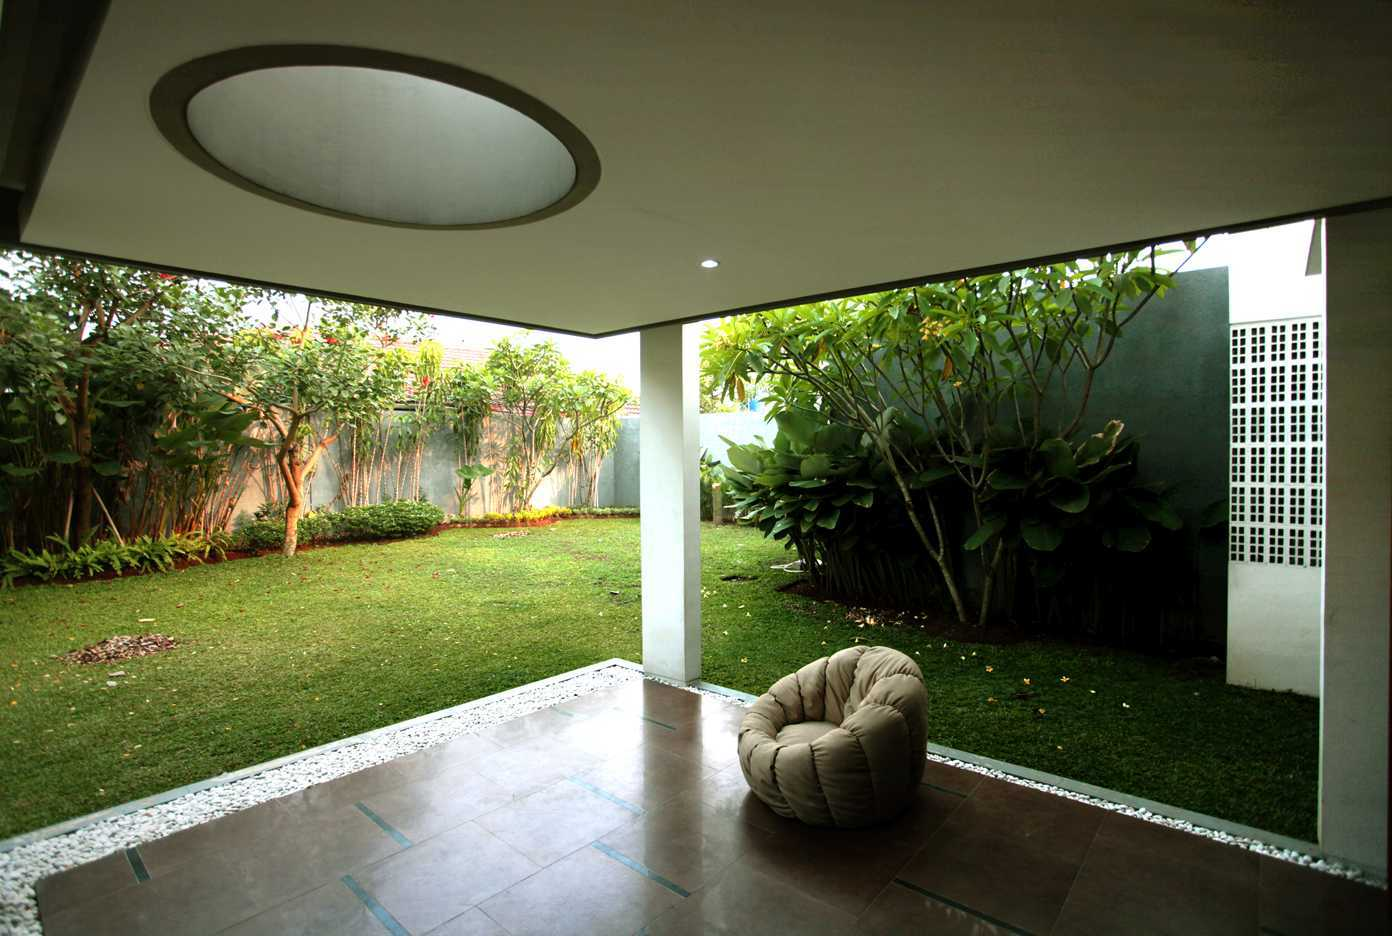 Armeyn Ilyas Doctor House Kelapa Dua Wetan, Ciracas, East Jakarta City, Jakarta, Indonesia Jakarta Terrace Modern 17747